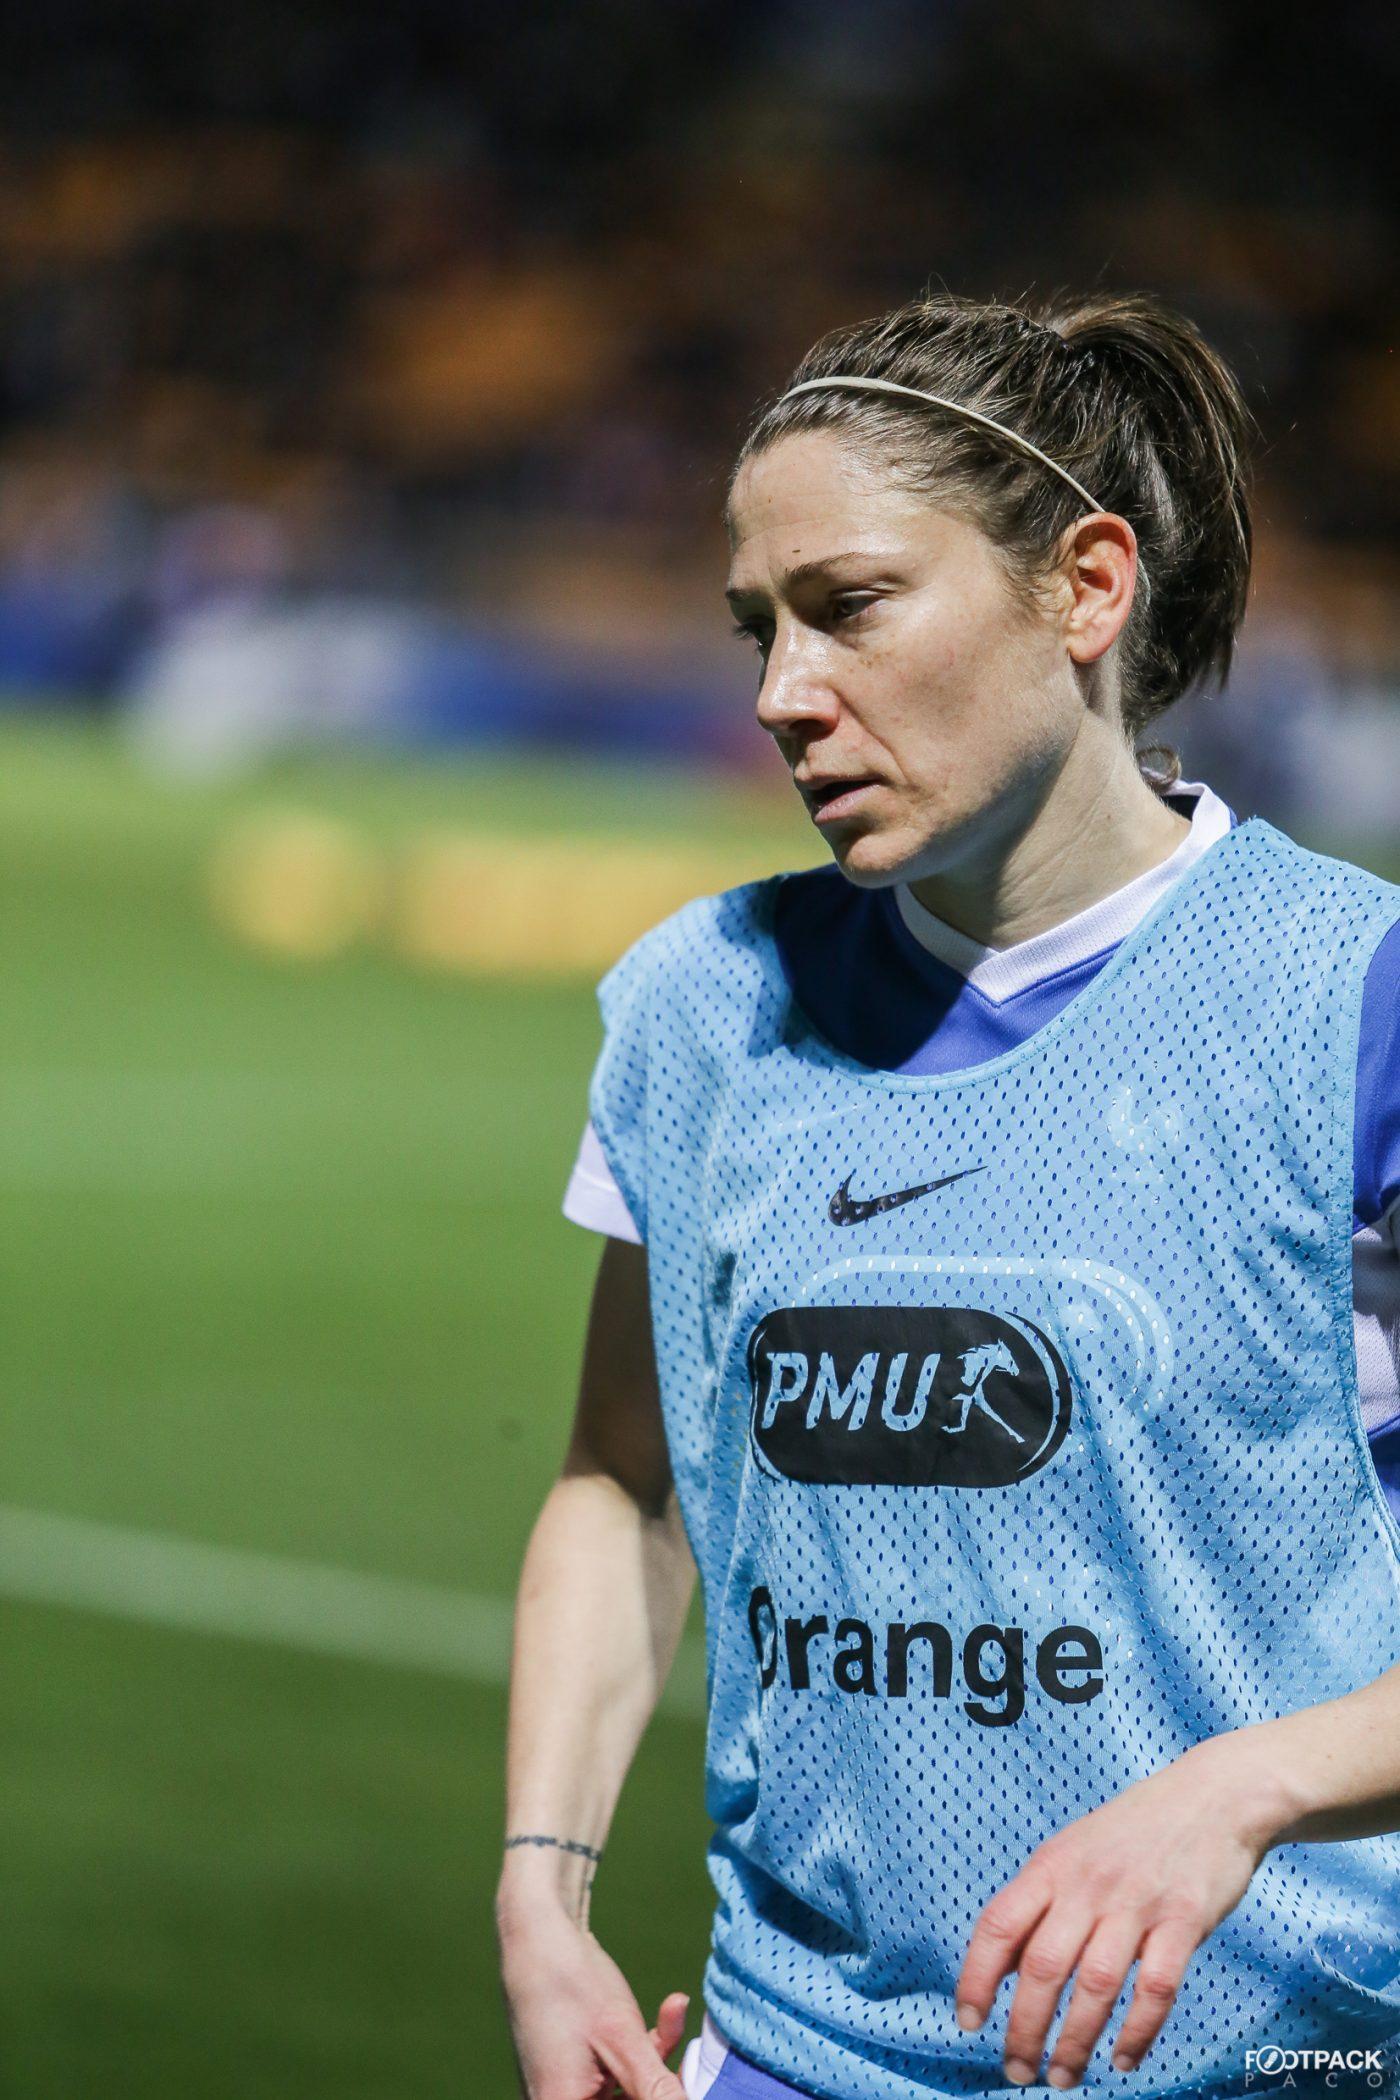 equipe-de-france-feminine-coupe-du-monde-2019-france-allemagne-elise-bussaglia